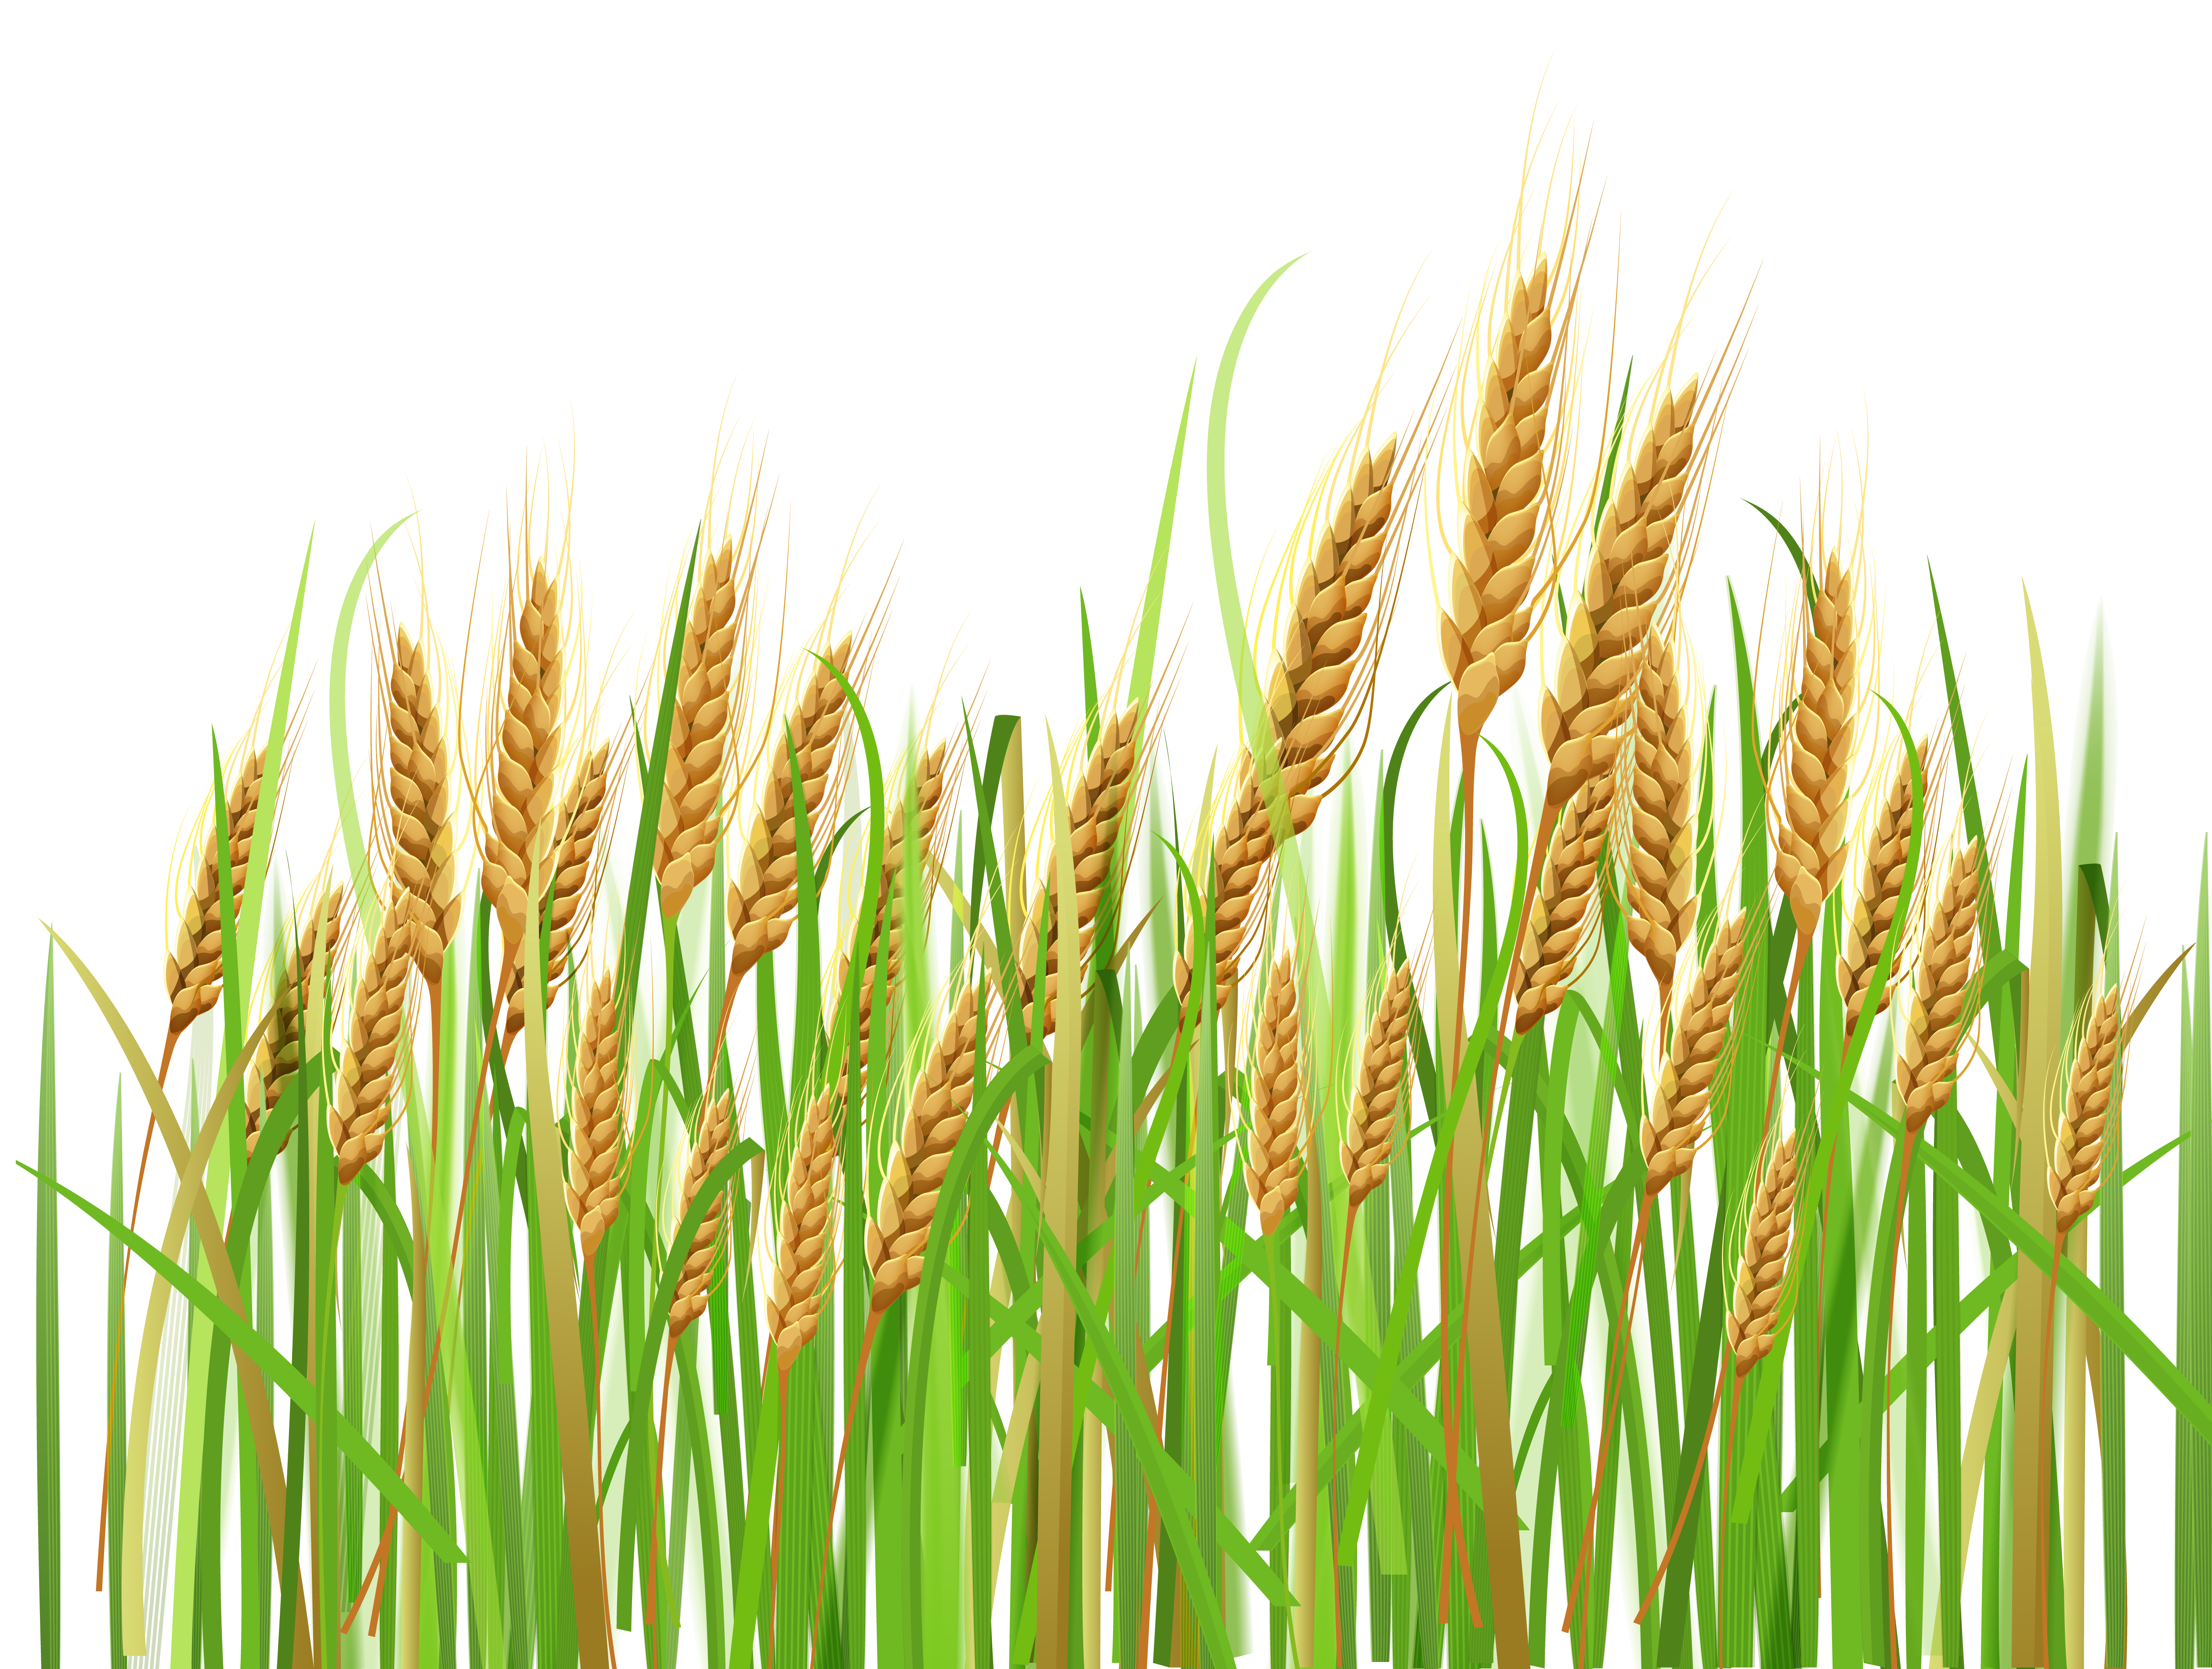 land clipart wheat field